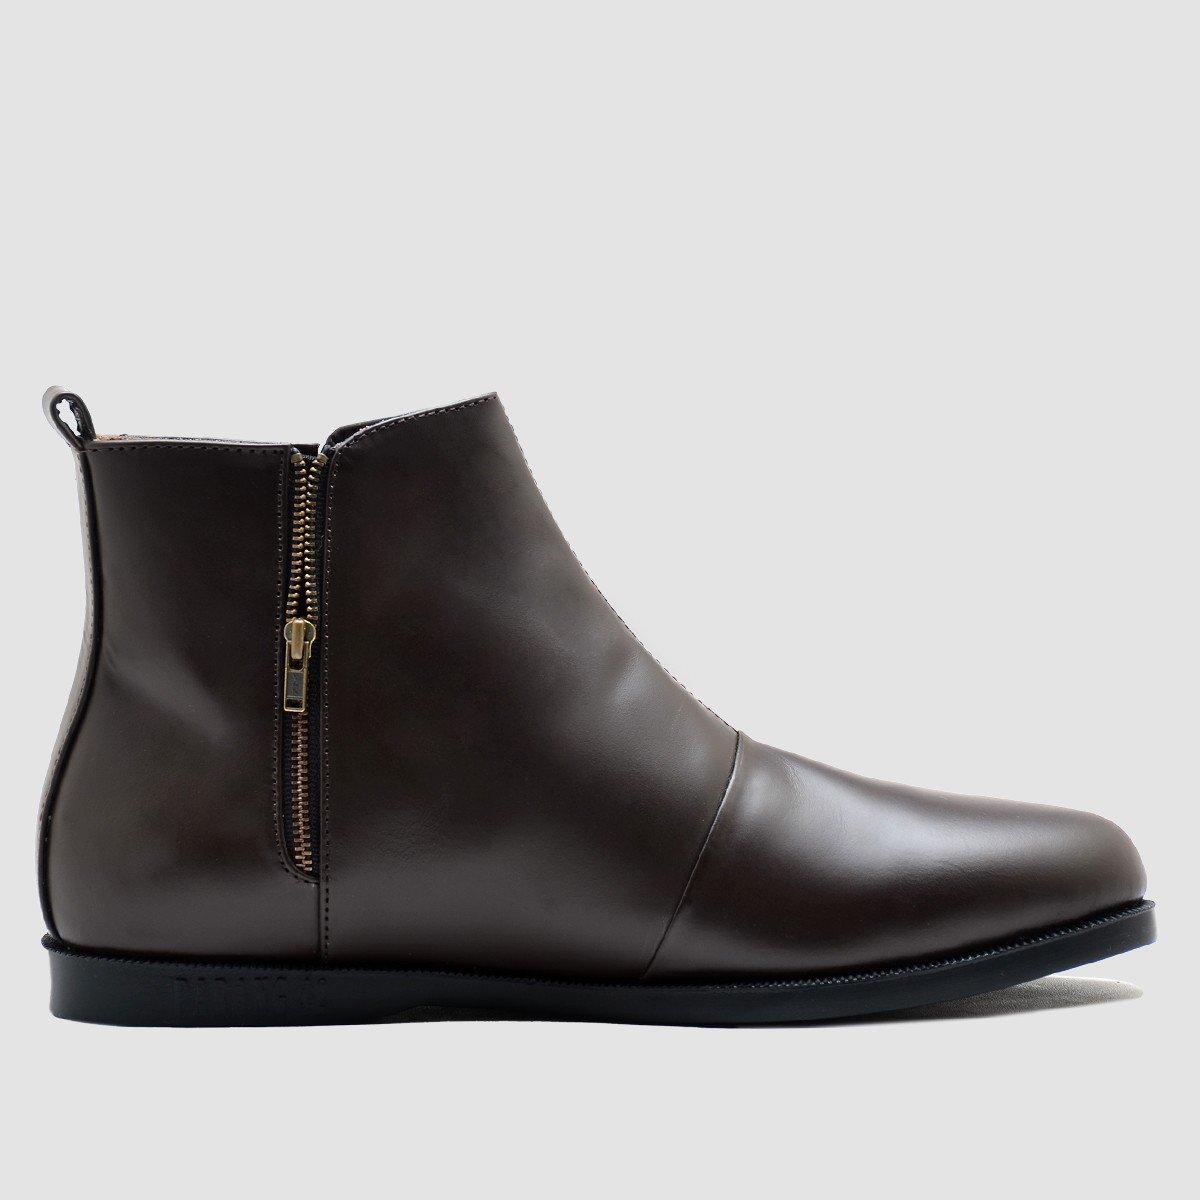 Segini Aja Harga Sepatu Brodo Footwear Terbaru 2019 ~ HARGAO.COM 9a4294b7b9